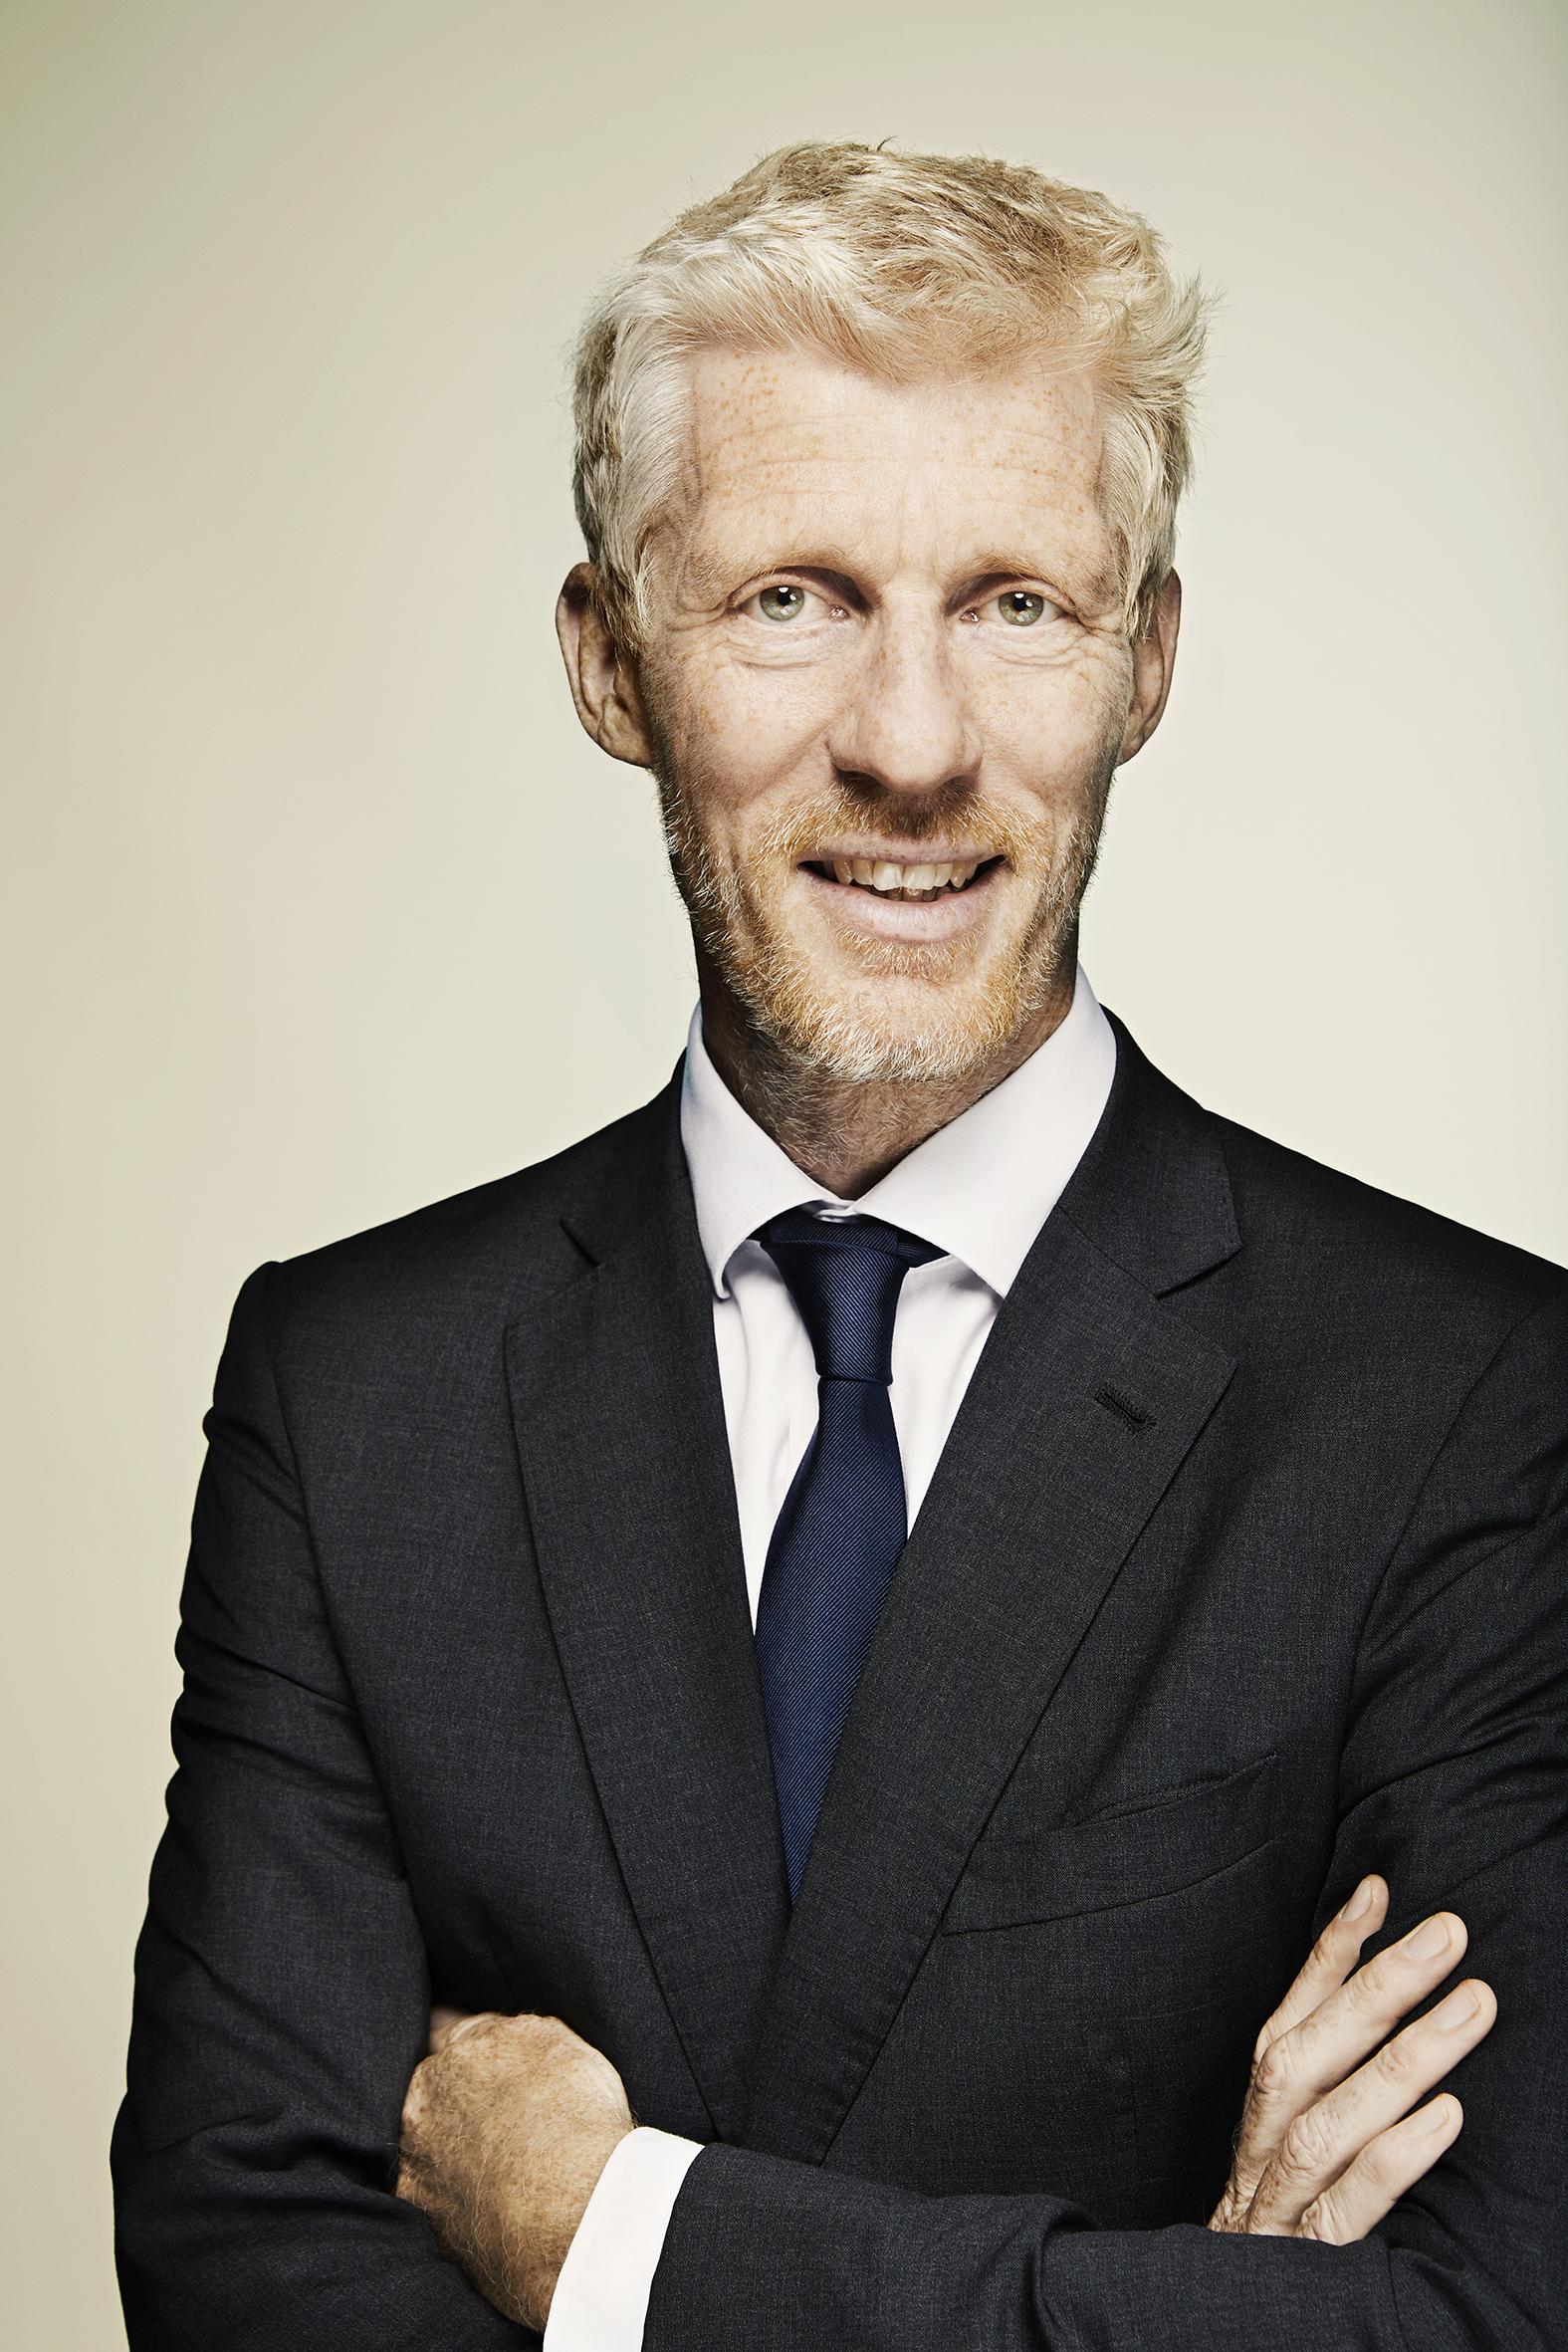 Frank Hvid Petersen - Associate Partner